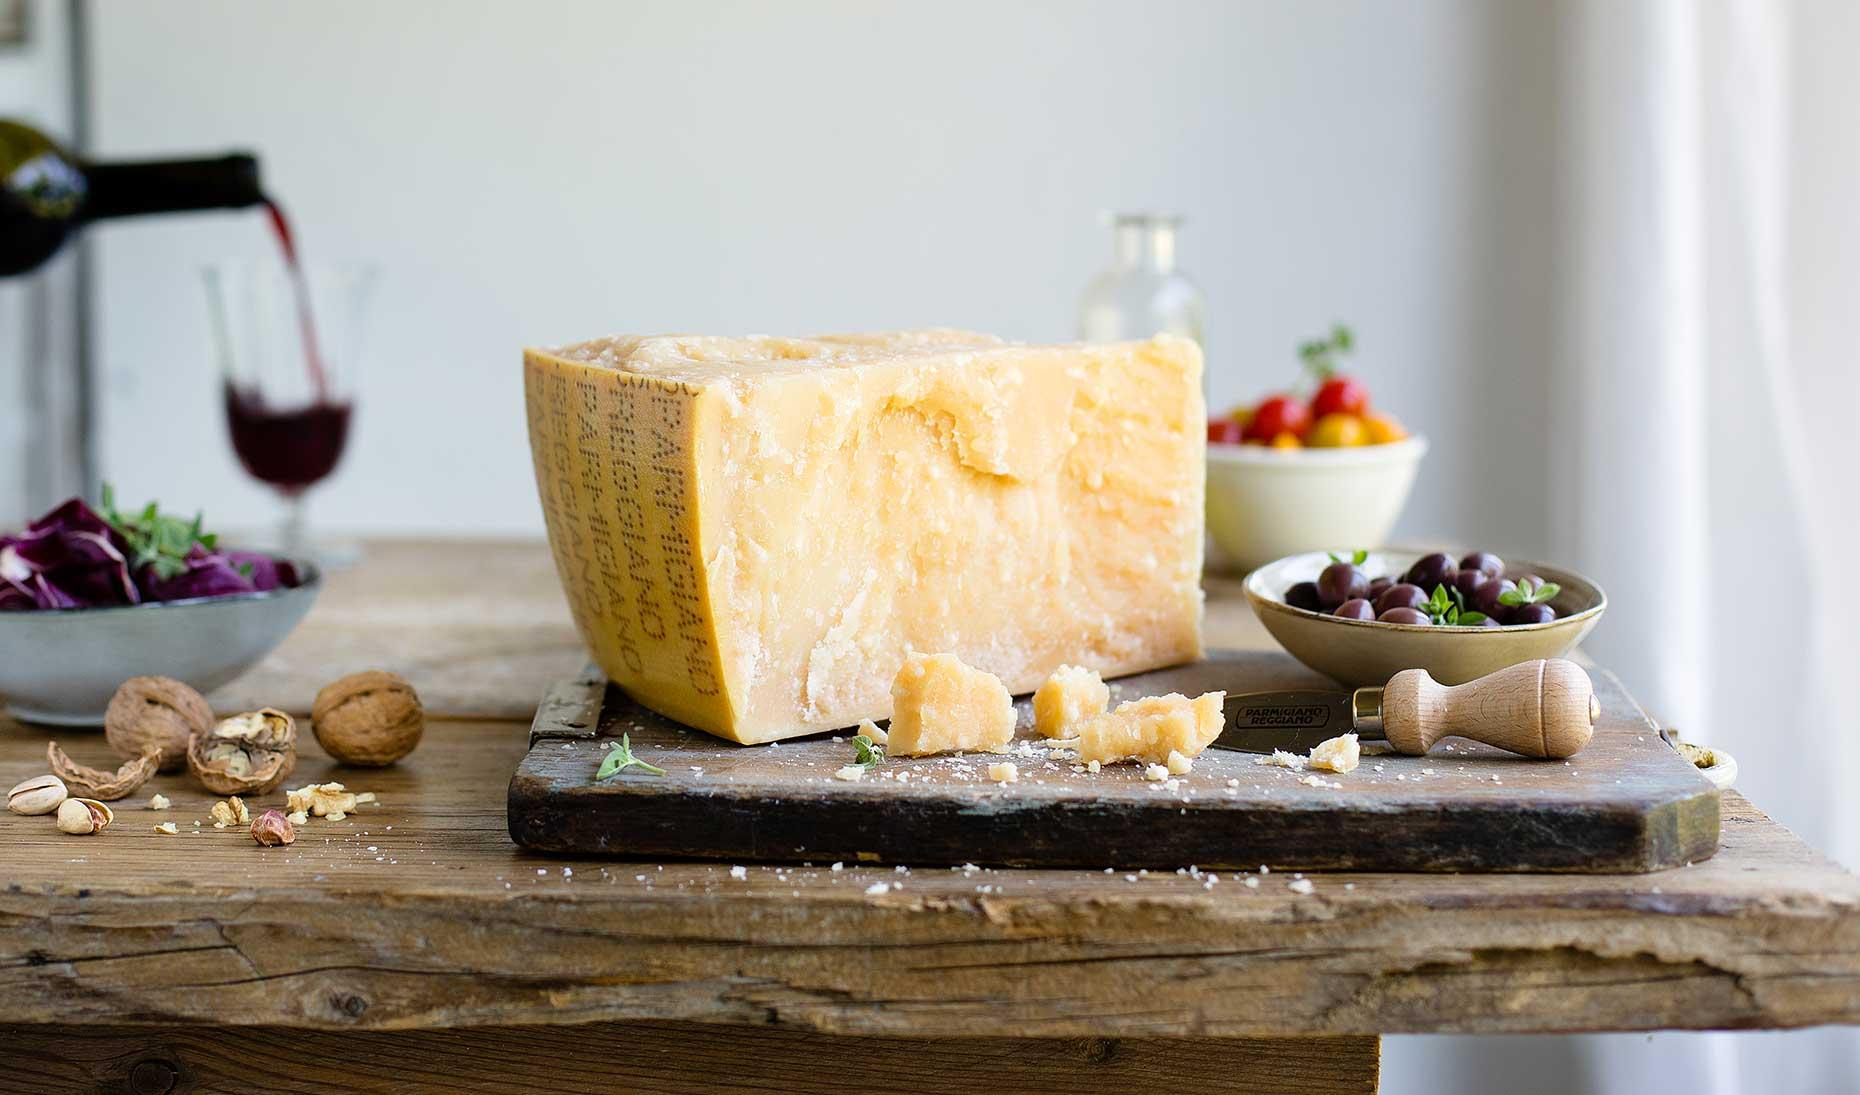 Medium-aged Parmigiano Reggiano (Image: Courtesy of Consortium of Parmigiano Reggiano)